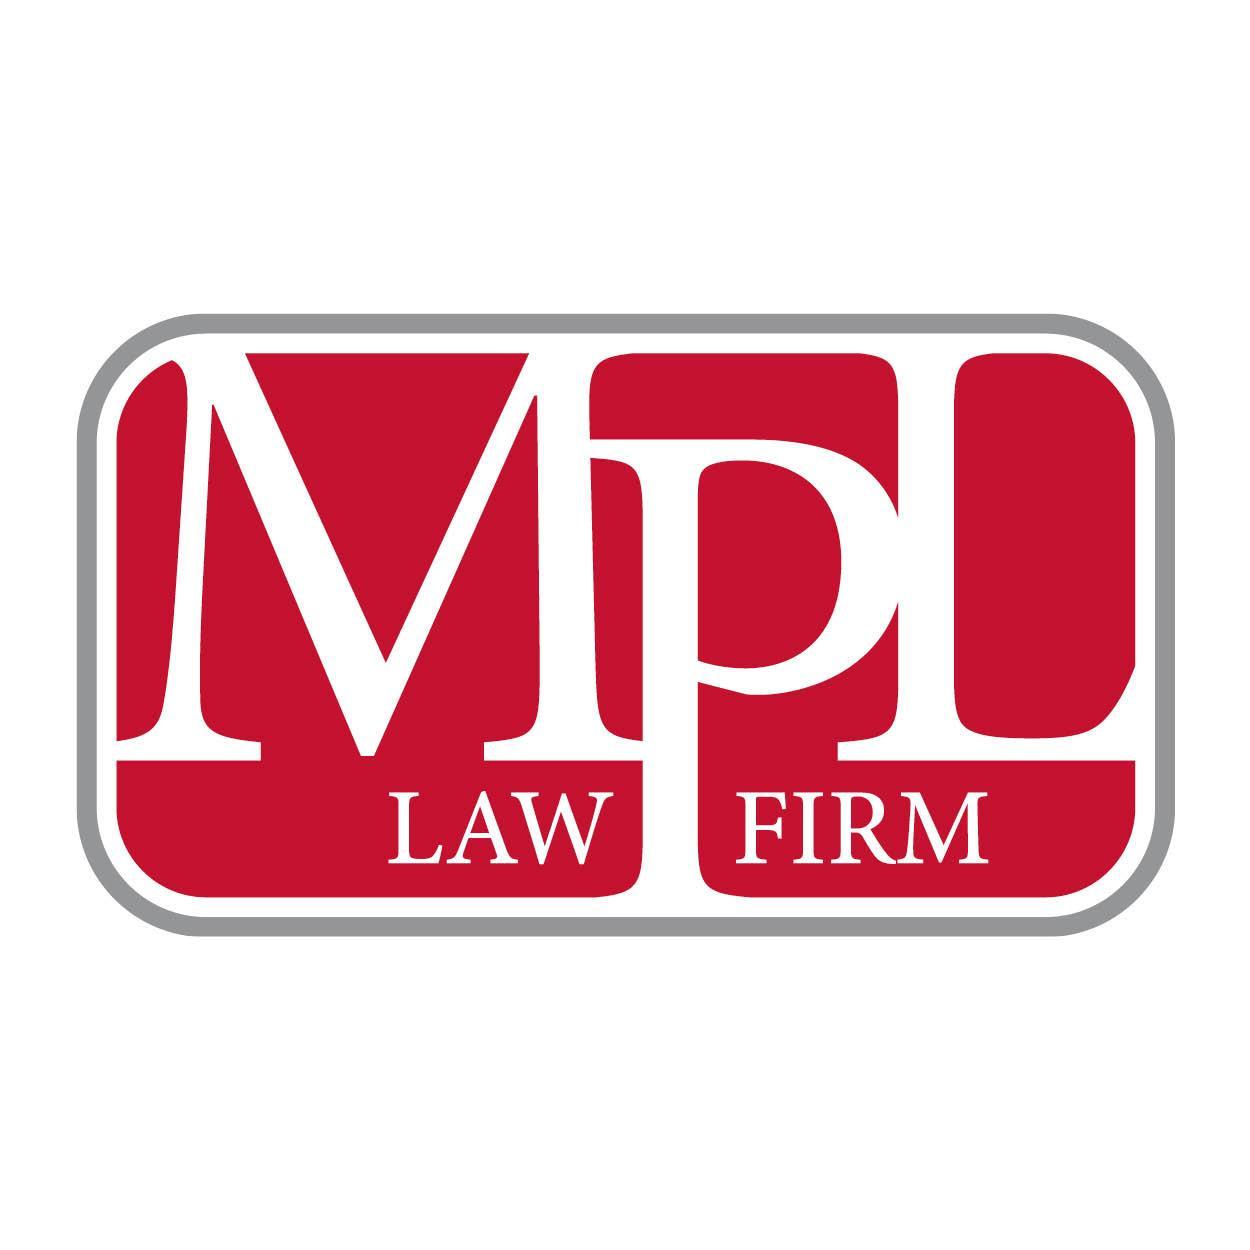 MPL Law Firm